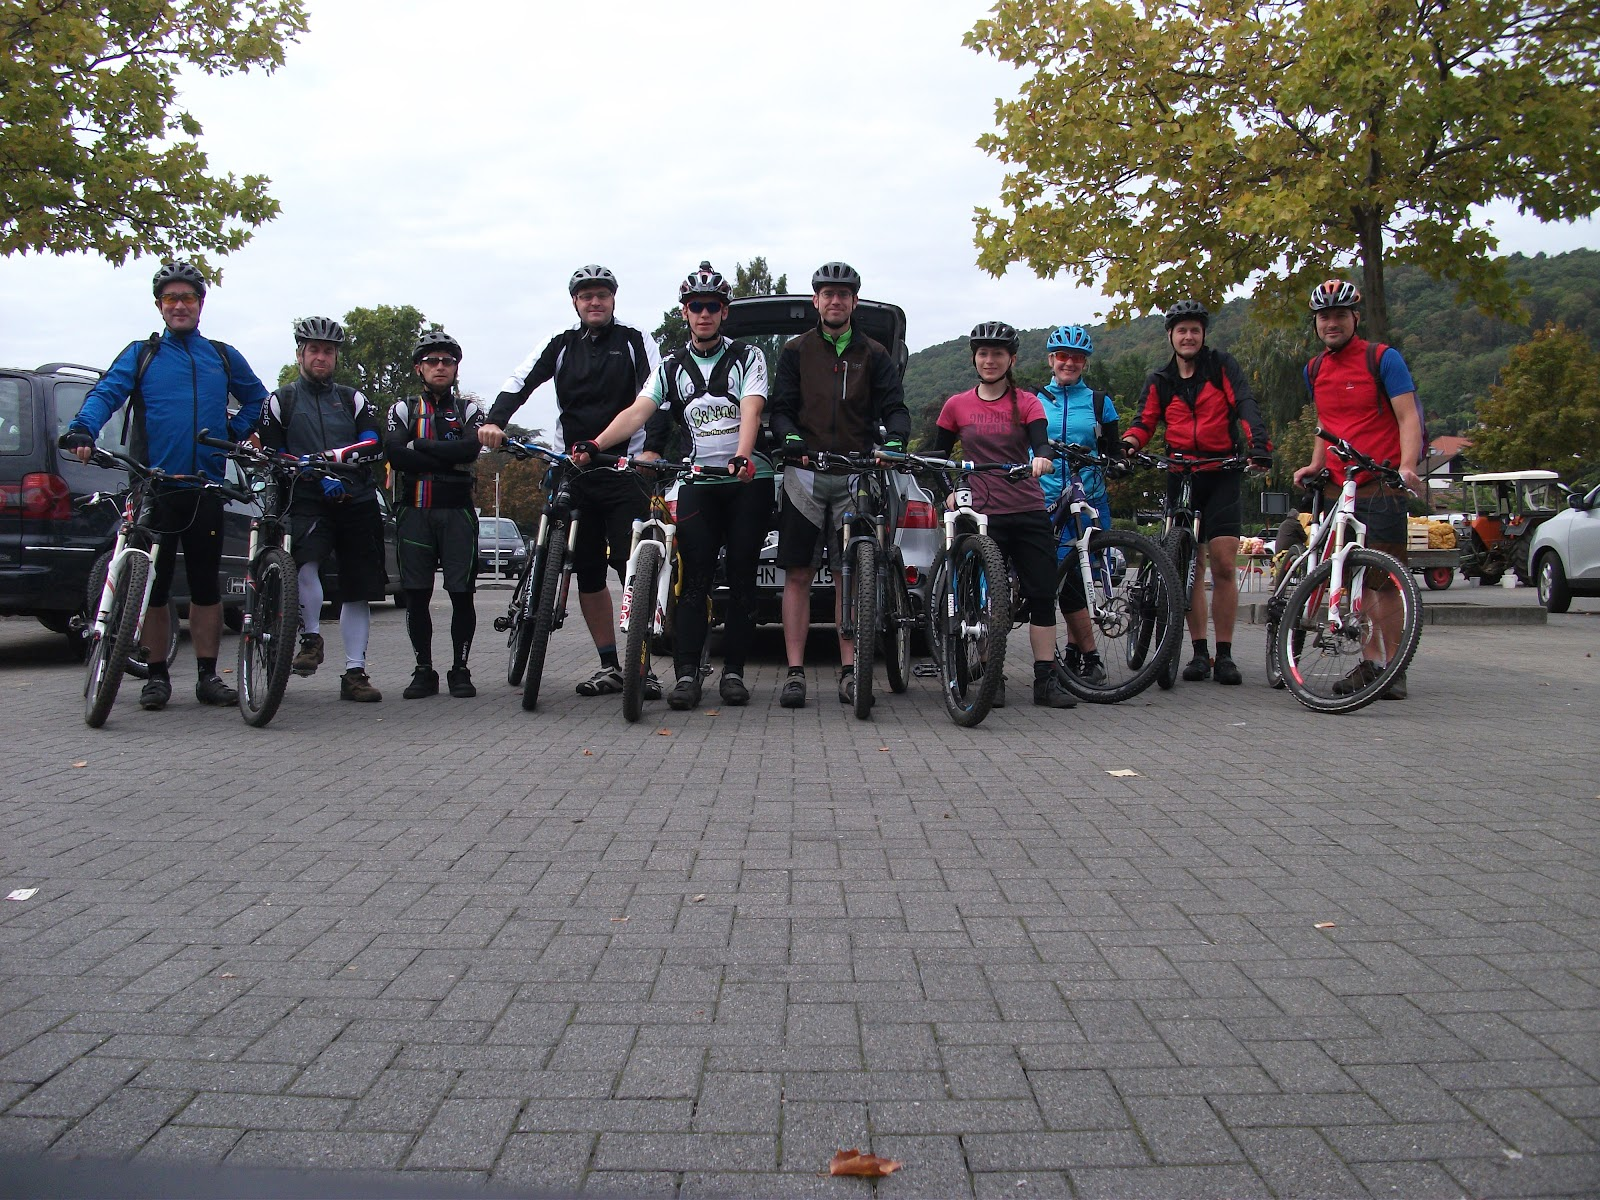 Pfalz - schiefe Sack Tour am 26.09.2015